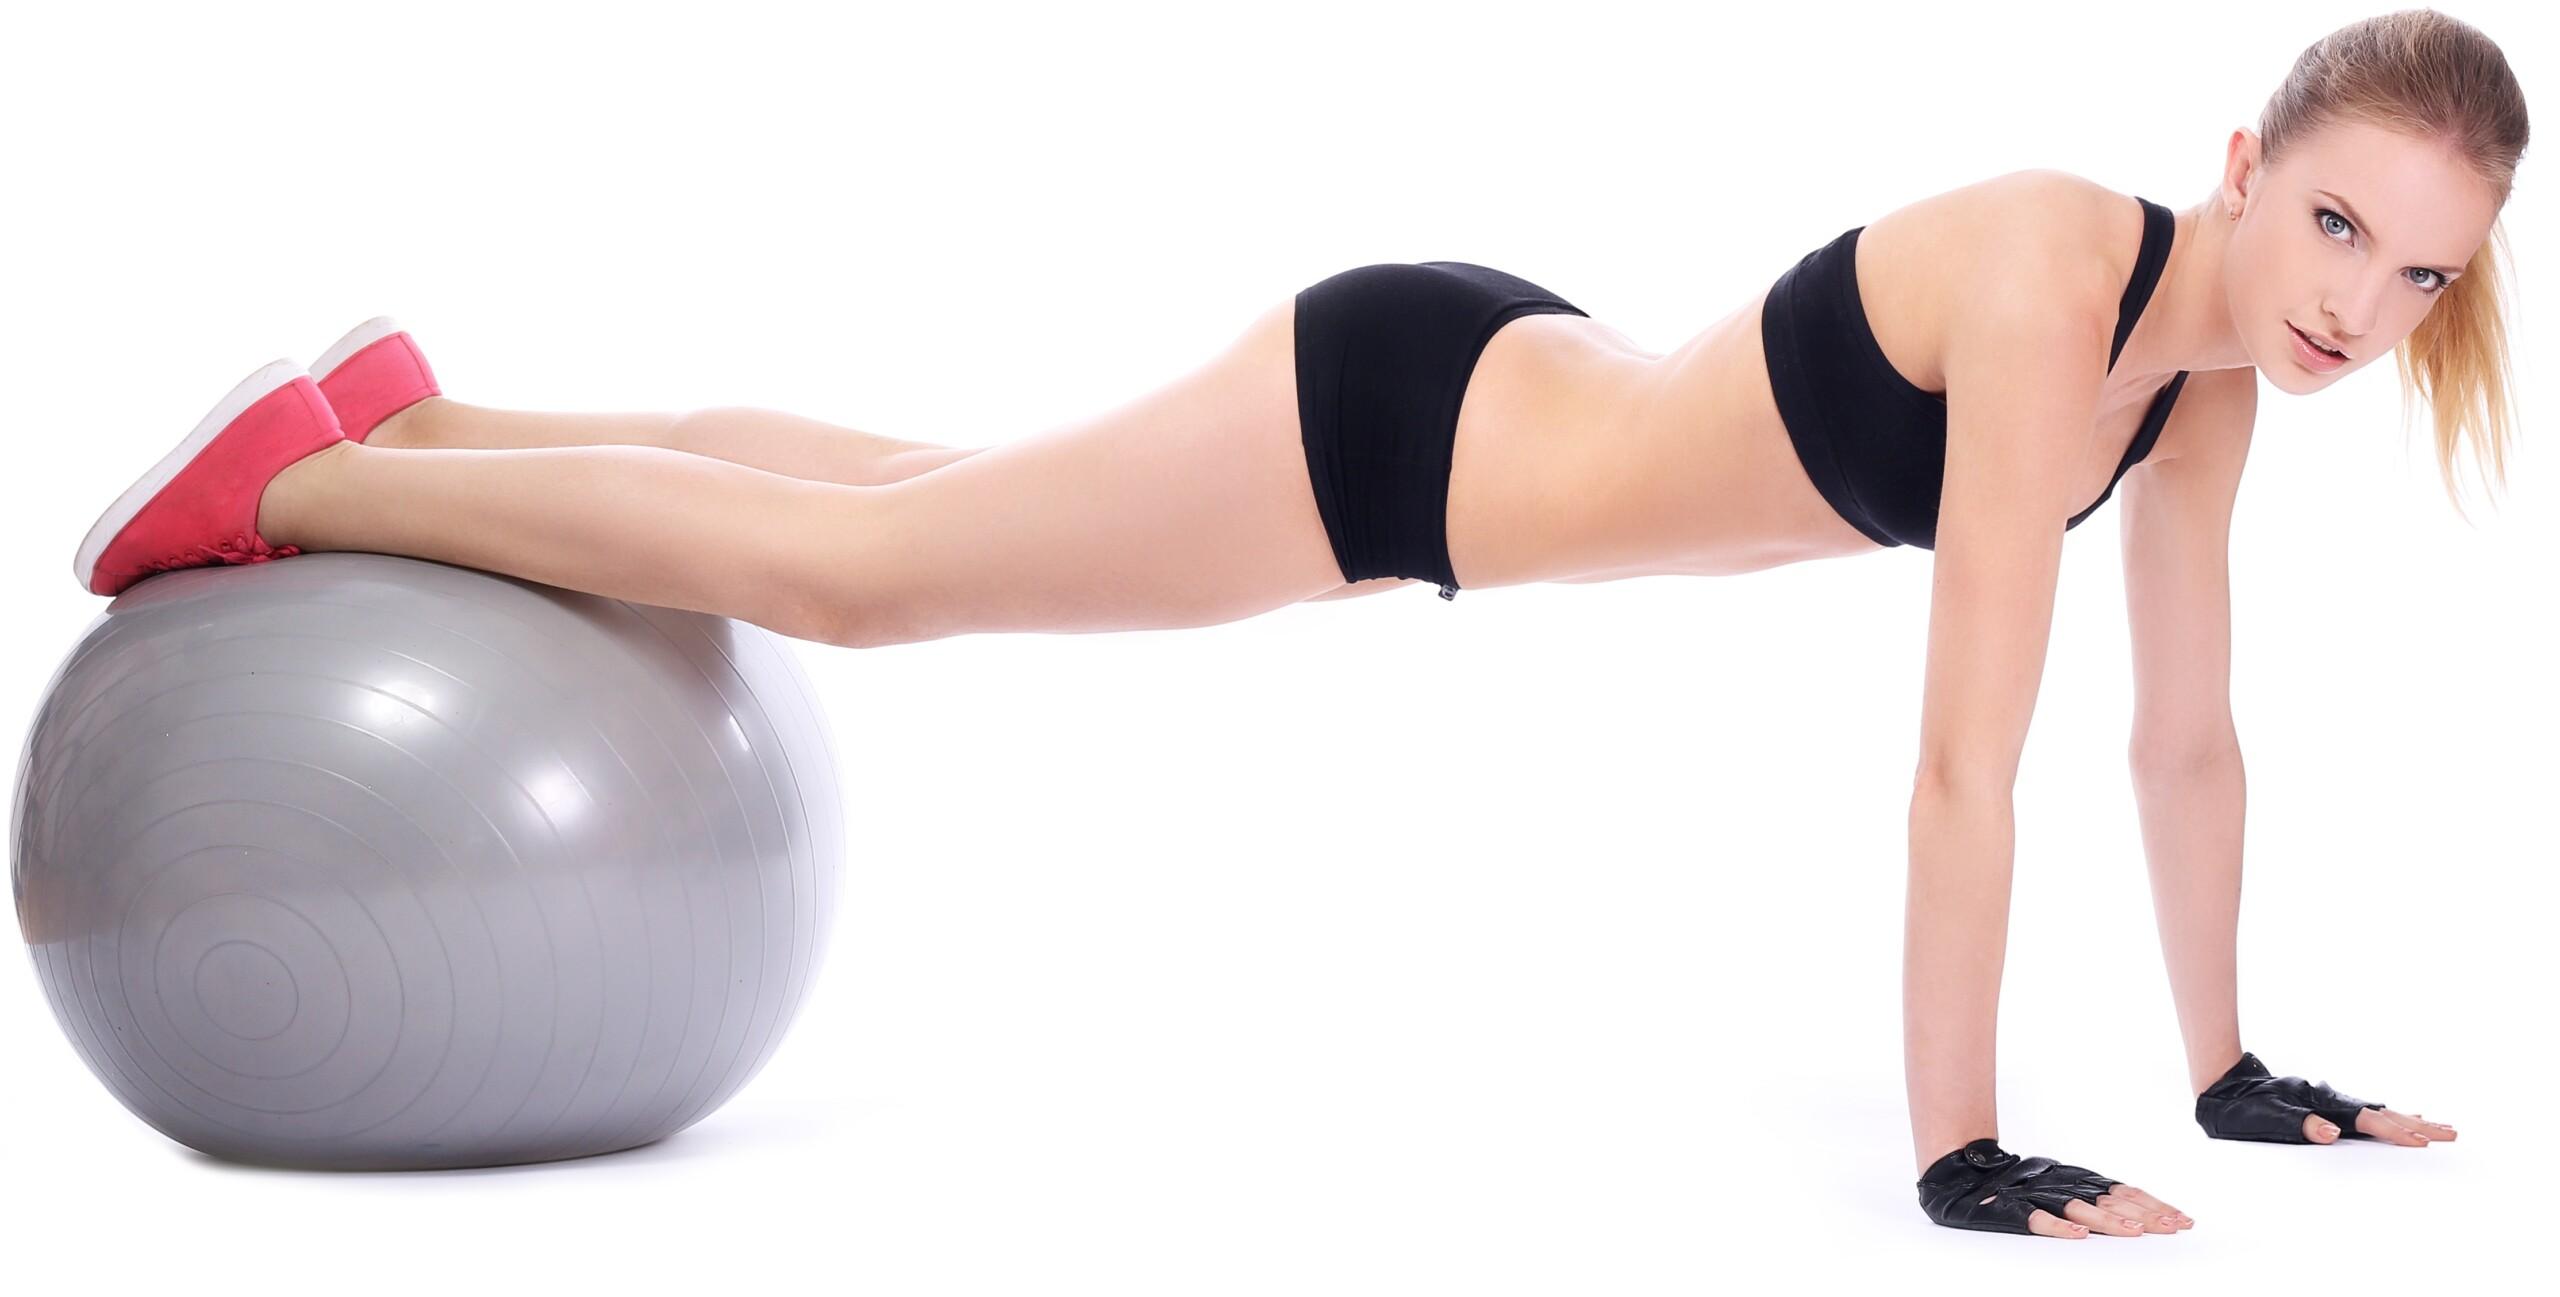 Pushups with Feet on a Fitness Ball vs. Regular Pushups